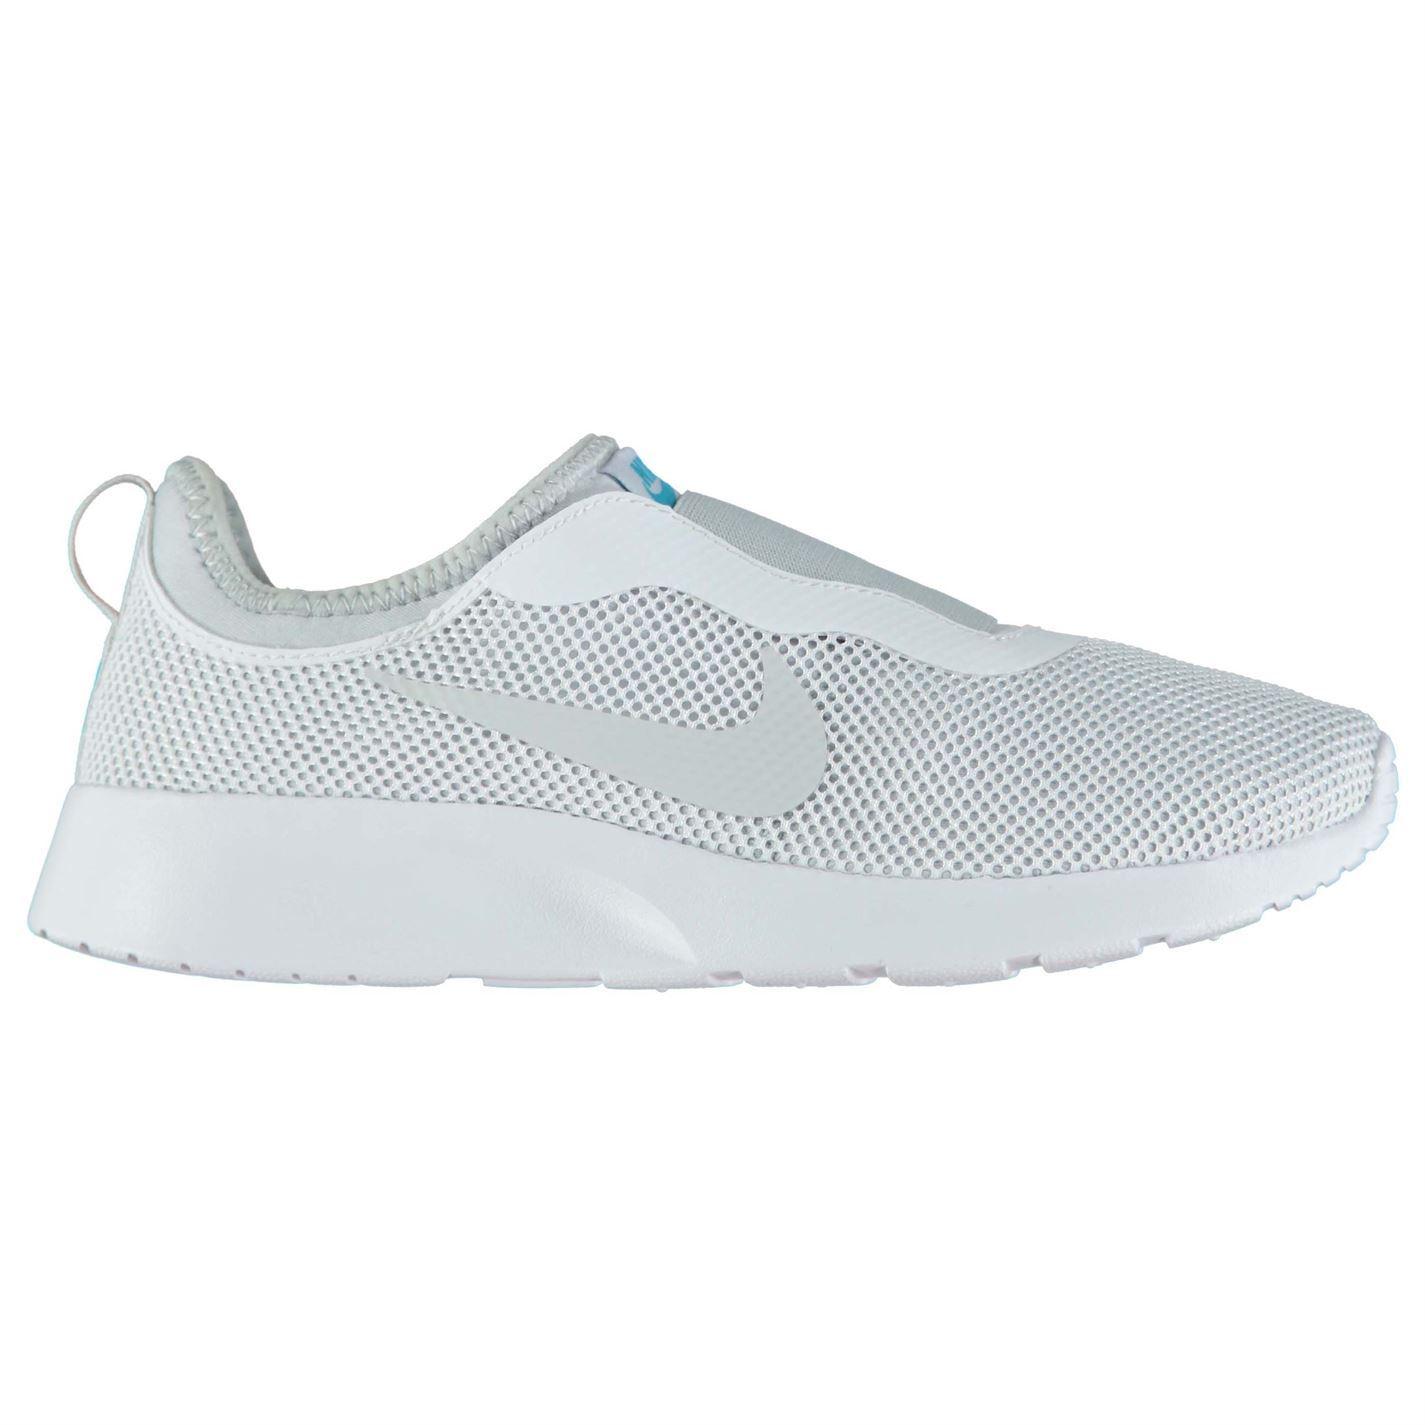 Nike Tanjun Slip On Trainers Womens White/Platinum Sports Trainers Sneakers